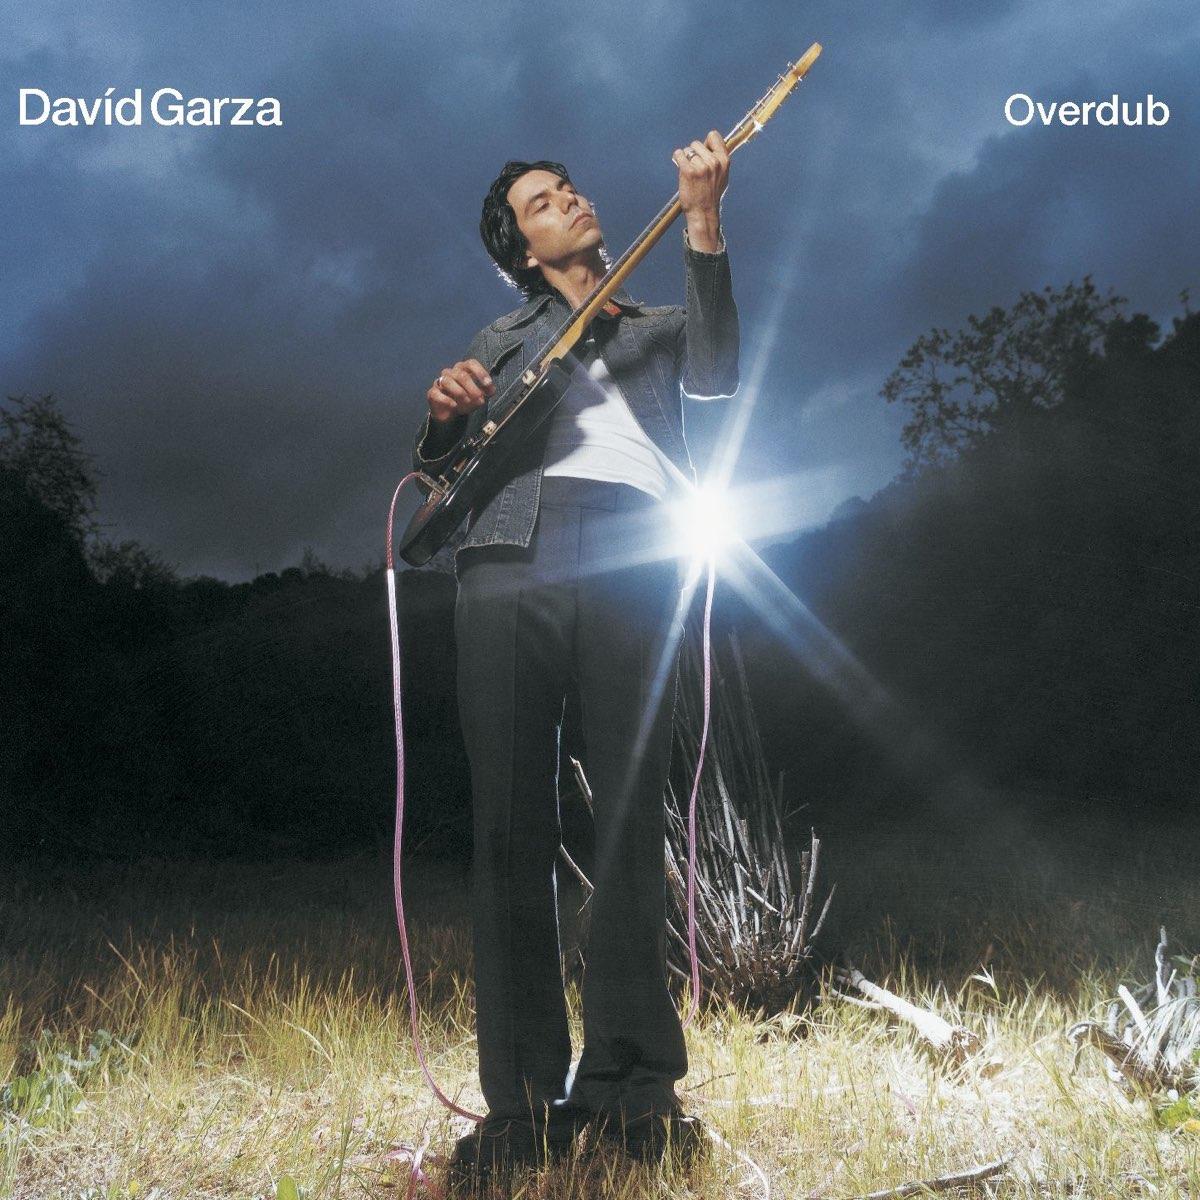 David Garza, Overdub